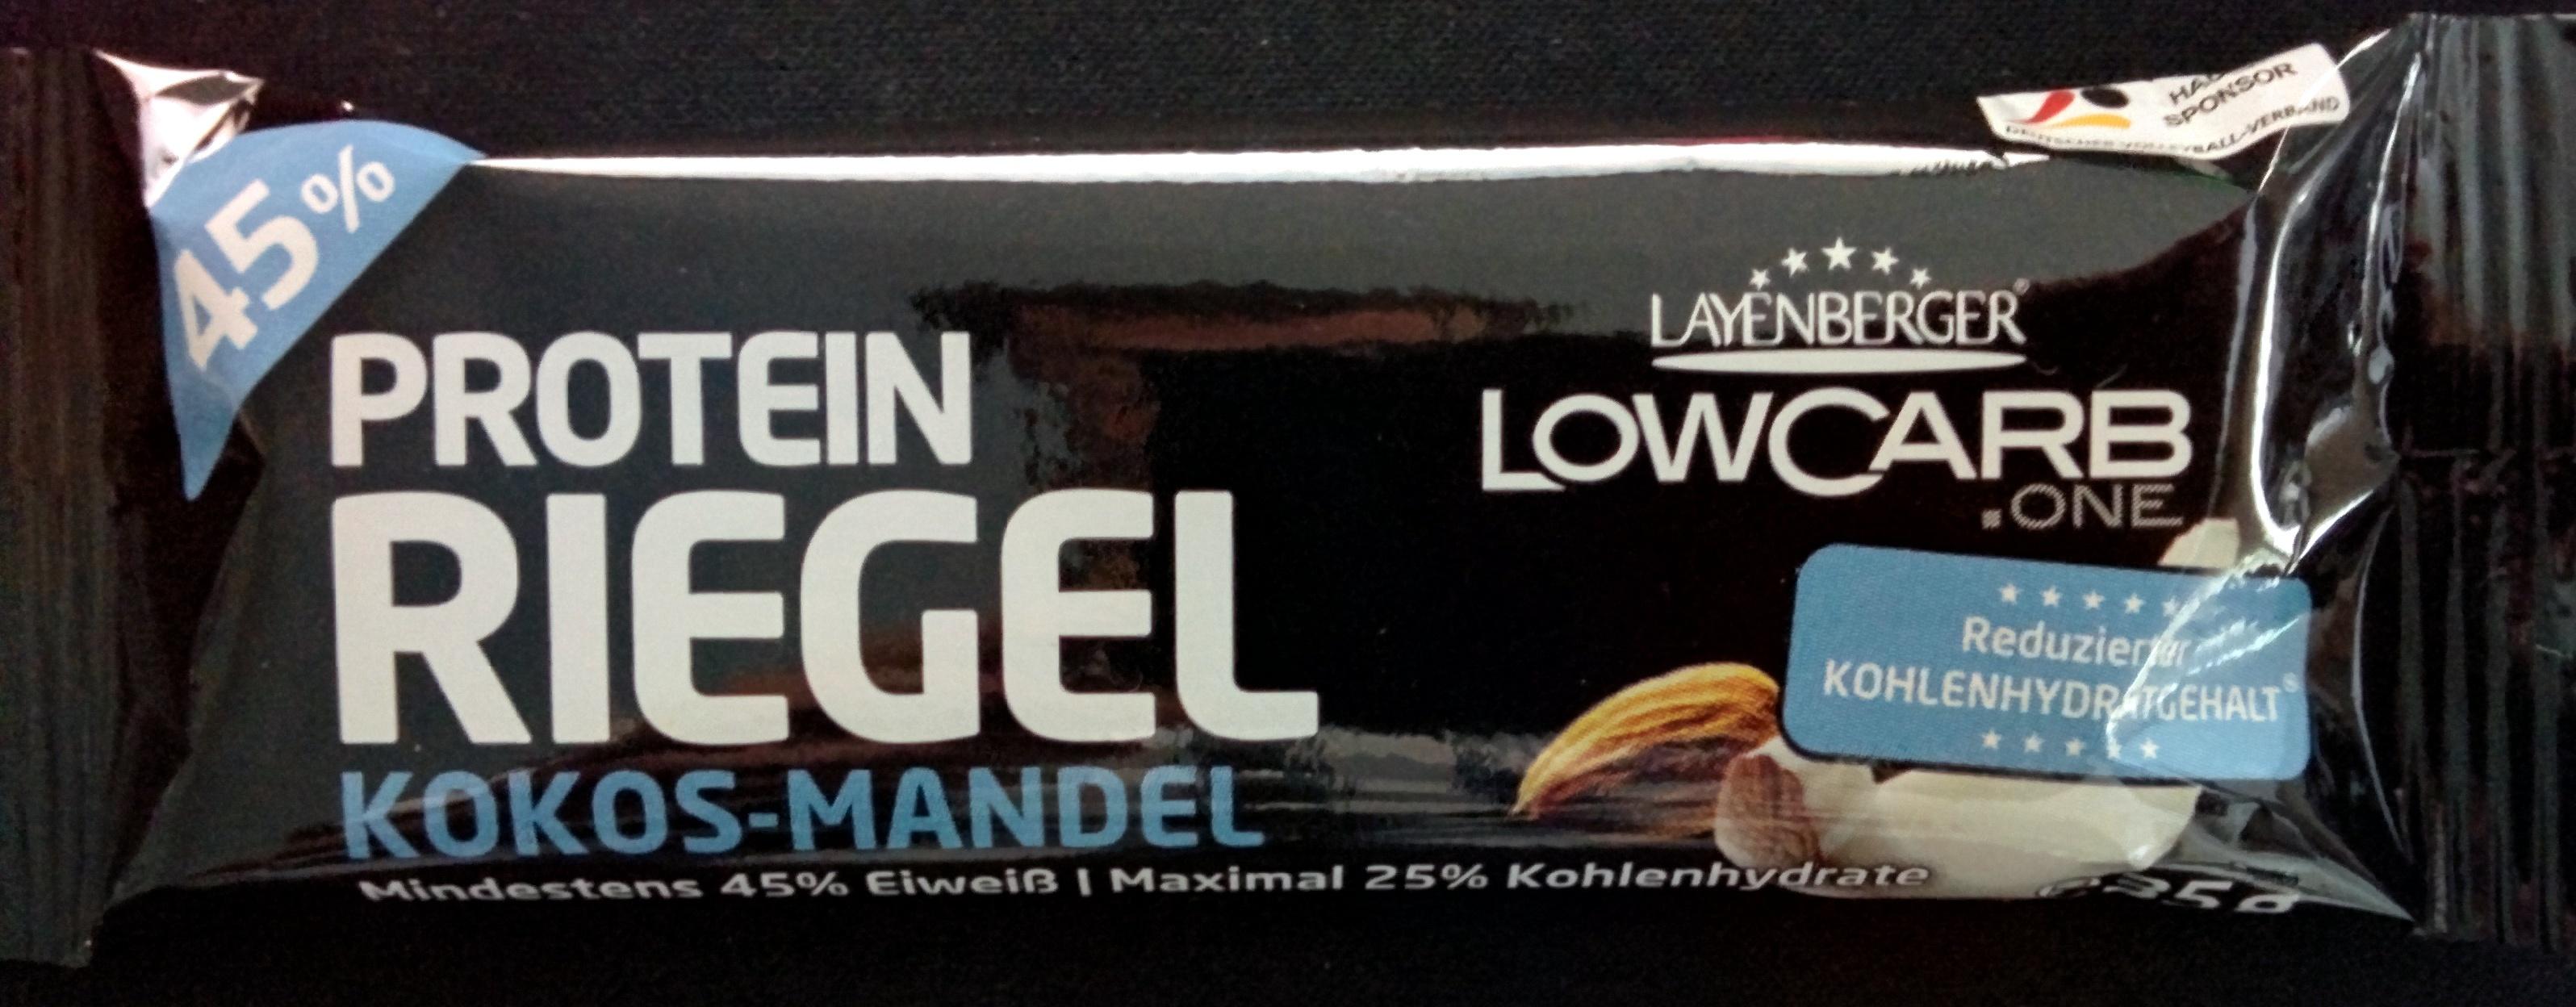 Protein Riegel Kokos-Mandel - Product - de